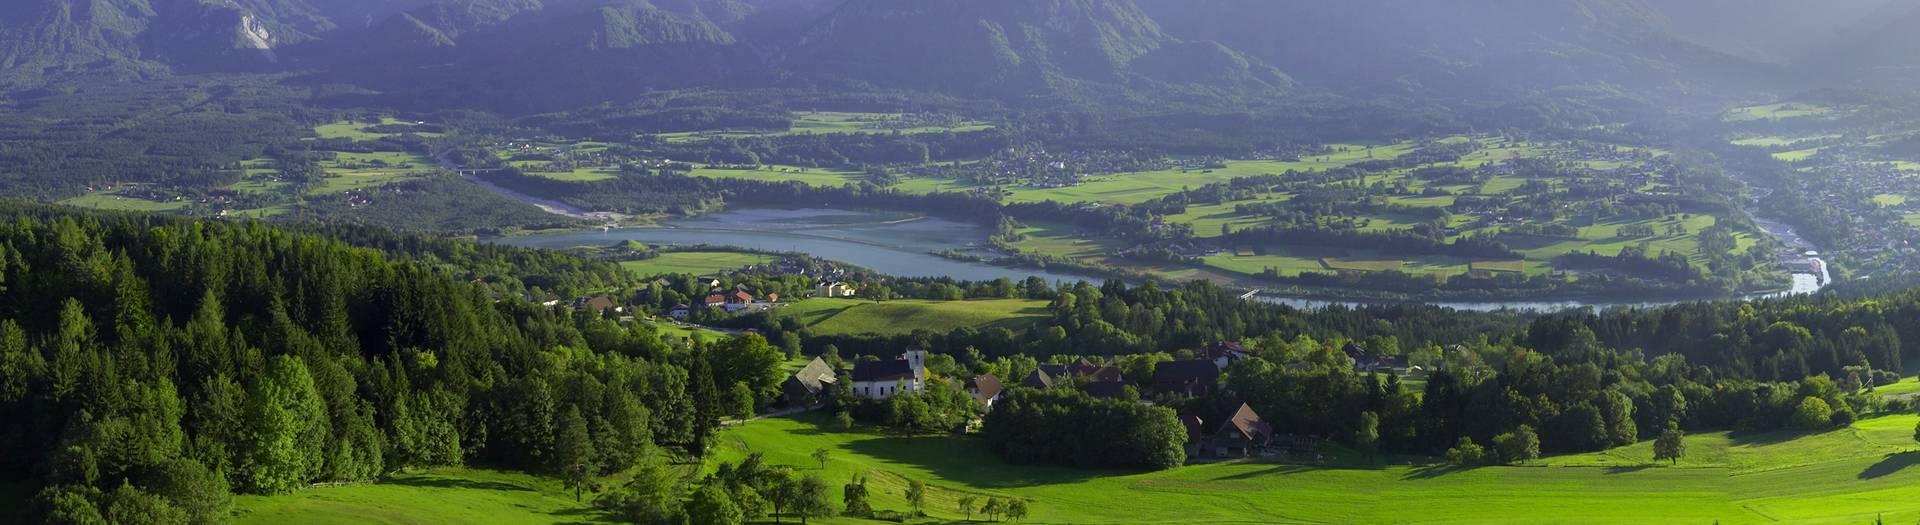 Landschaftsbild Rosental